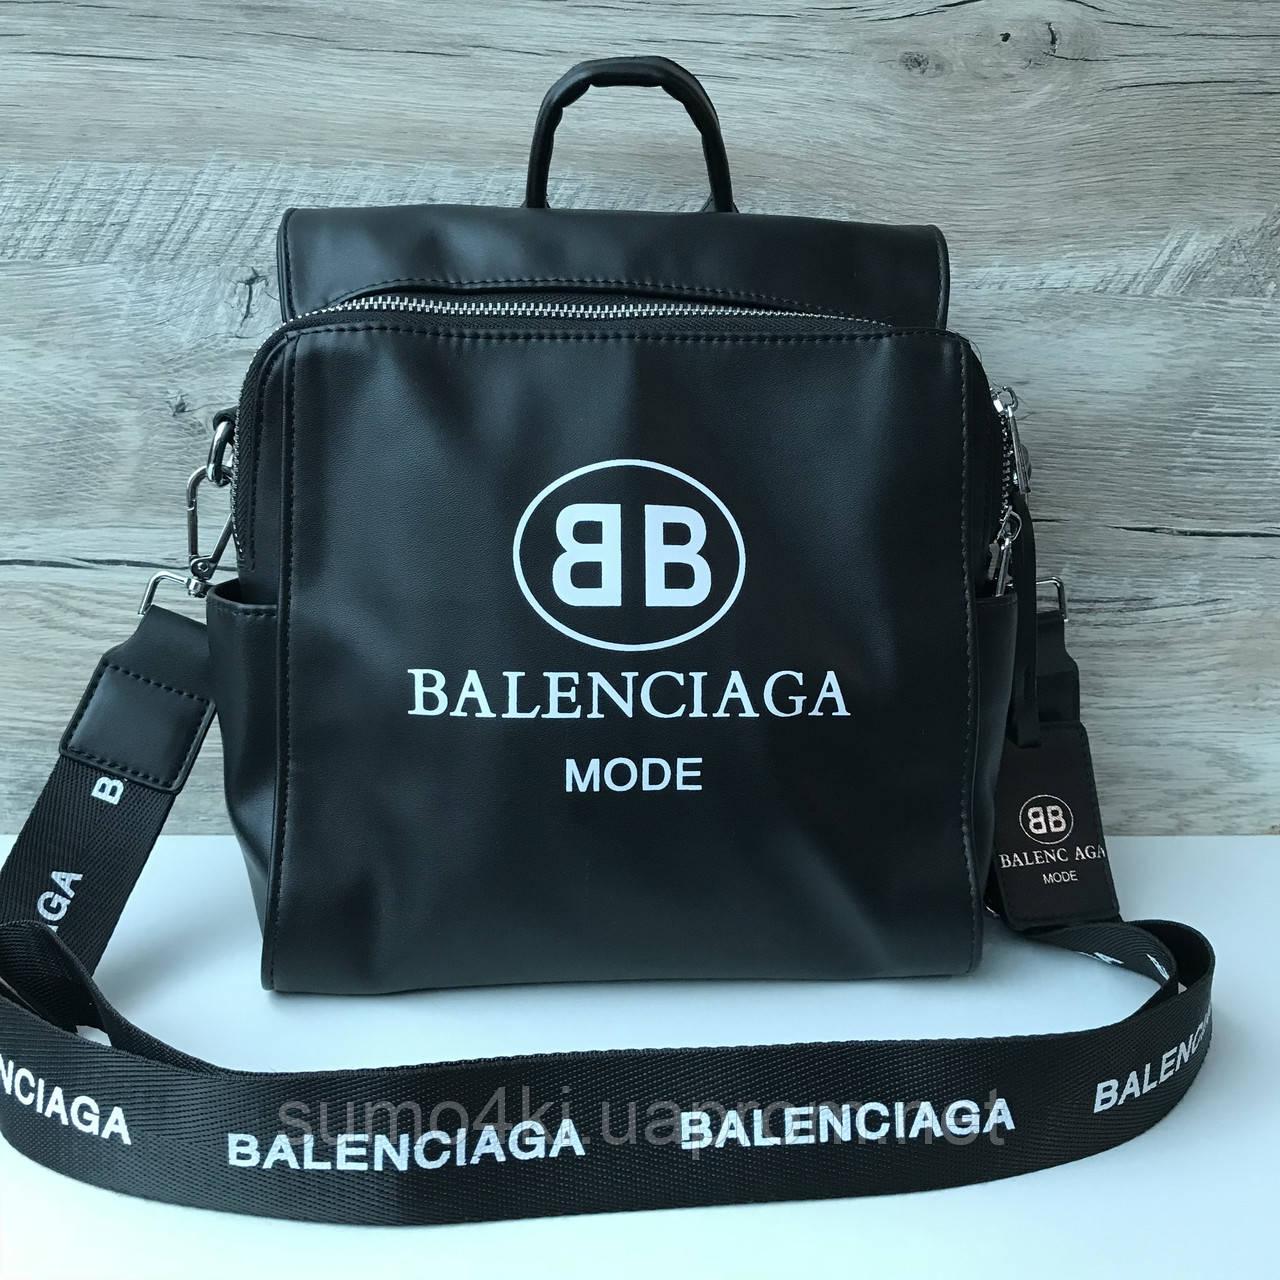 440cecc4a596 Женский рюкзак сумка Balenciaga - Интернет-магазин «Галерея Сумок» в Одессе